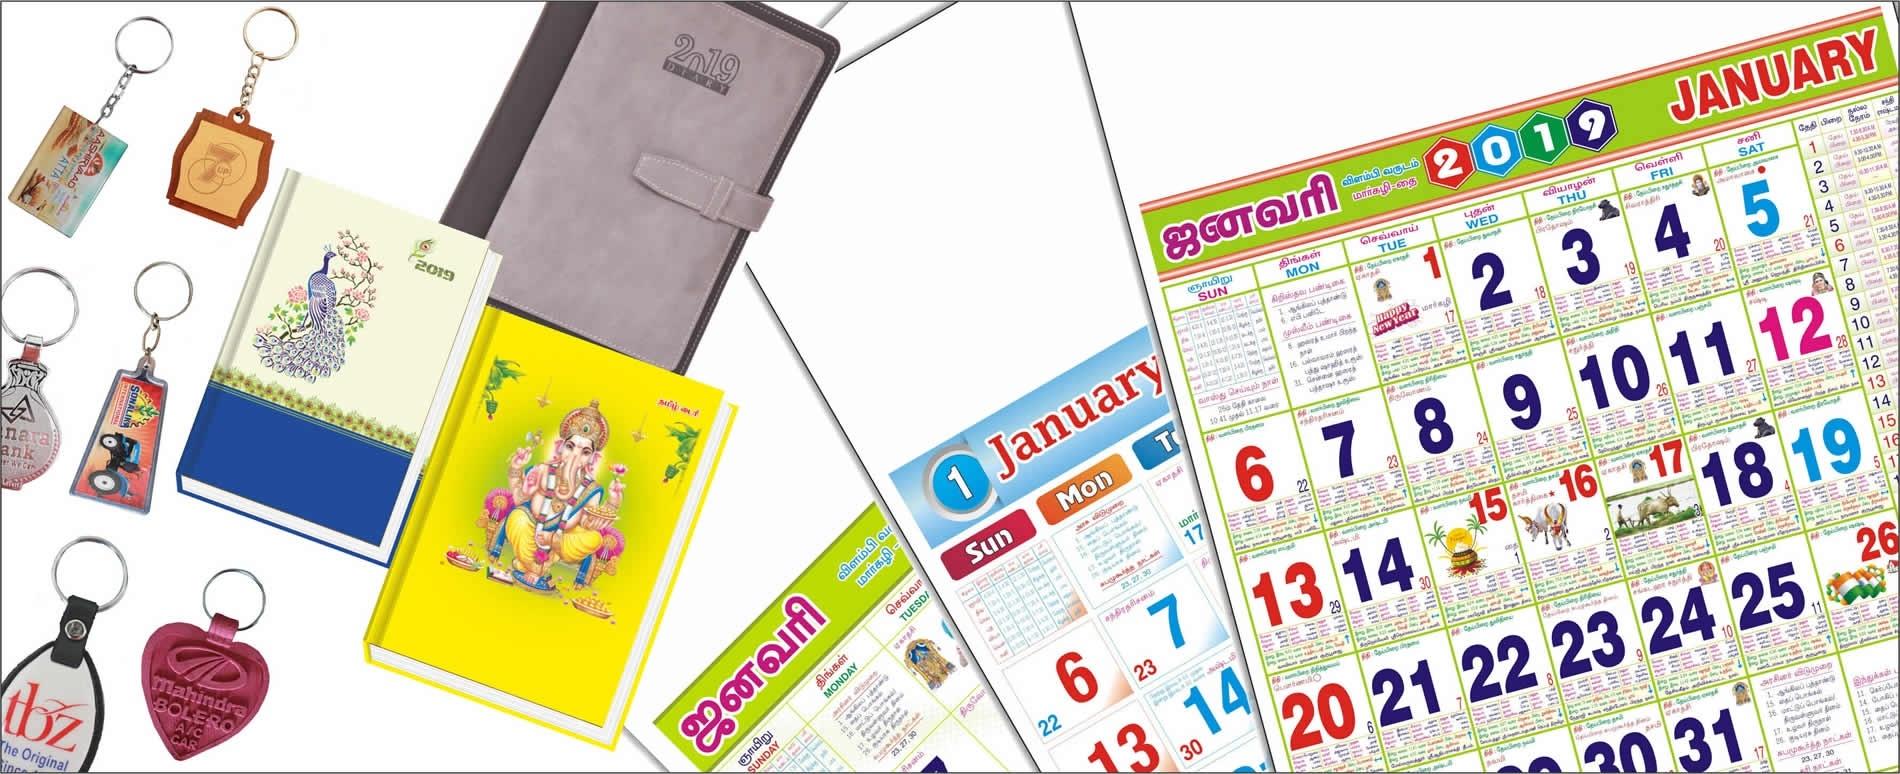 Sibhu Prints - Monthly Calendar, Offset Printing, Keychain_Calendar Printing Tamil Nadu